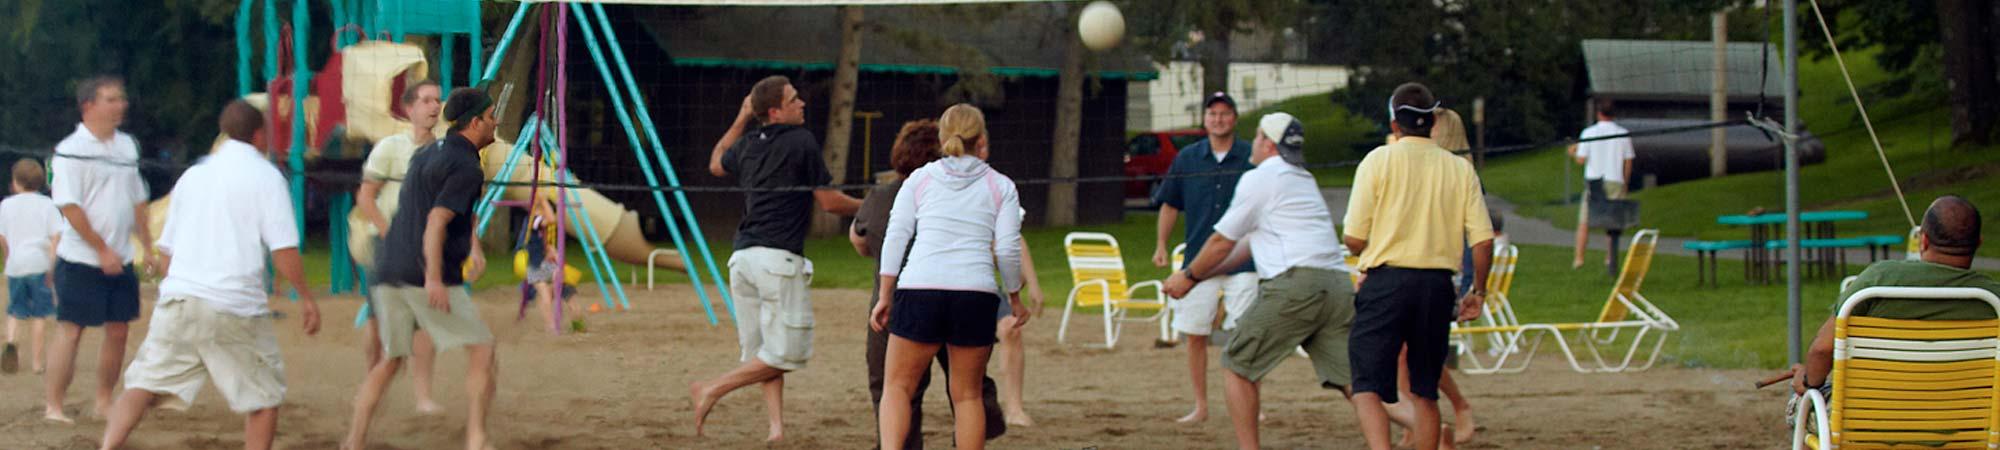 slide-Reunion_volleyball_2000x450